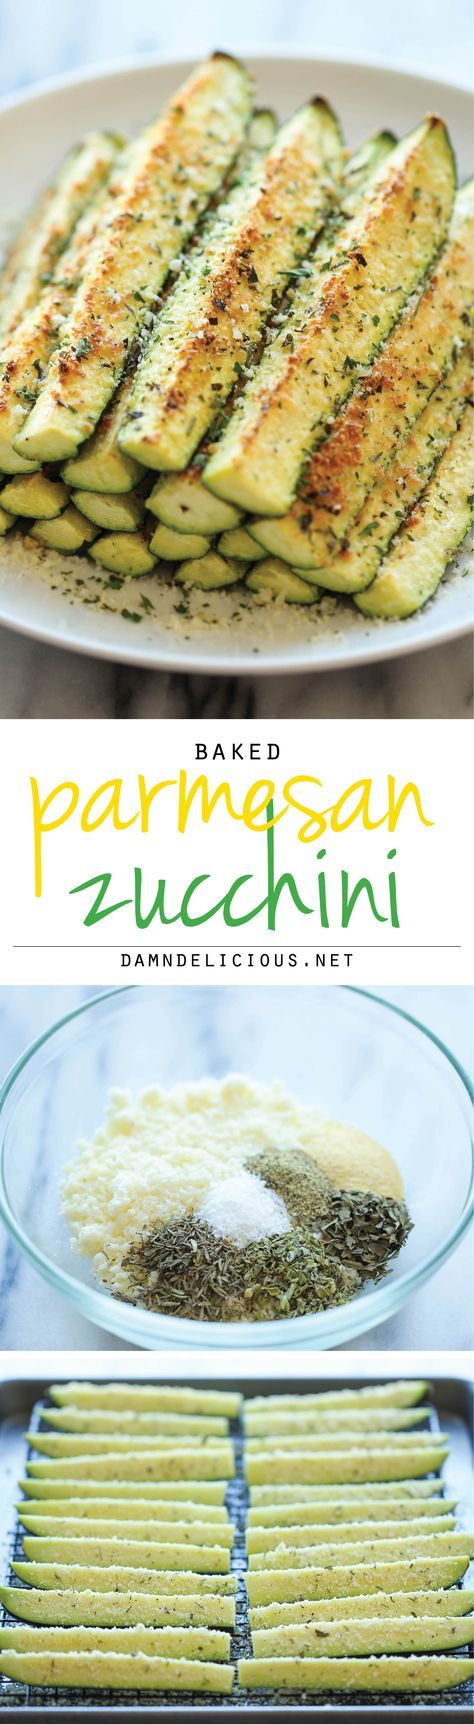 Baked Parmesan Zucchini - Crisp, tender zucchini sticks [ Vacupack.com ] #healthy #quality #fresh